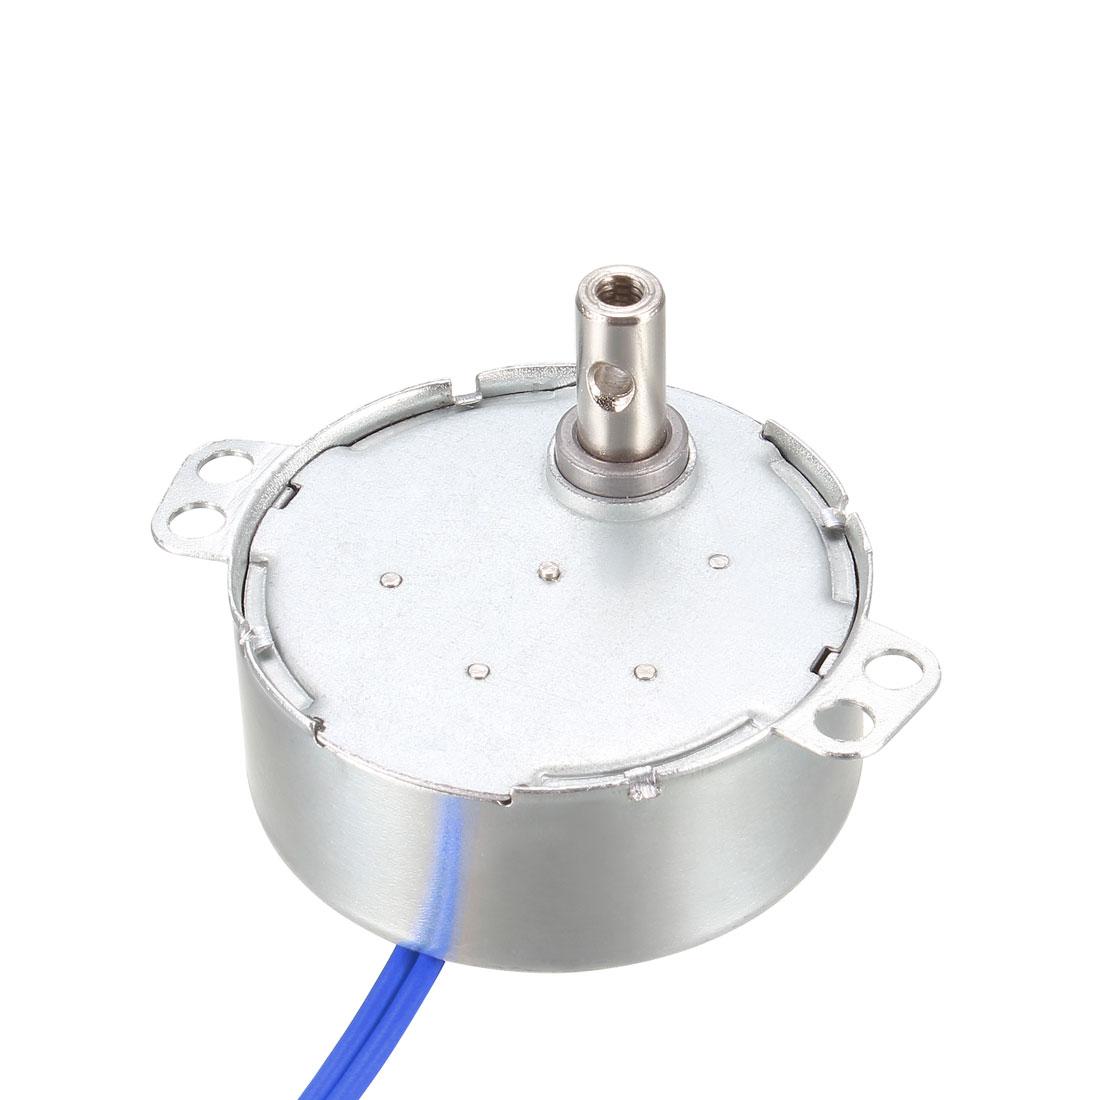 Electric Synchronous Synchron Motor Motor 100-127 VAC 50-60Hz CCW/CW 4W 0.8-1RPM